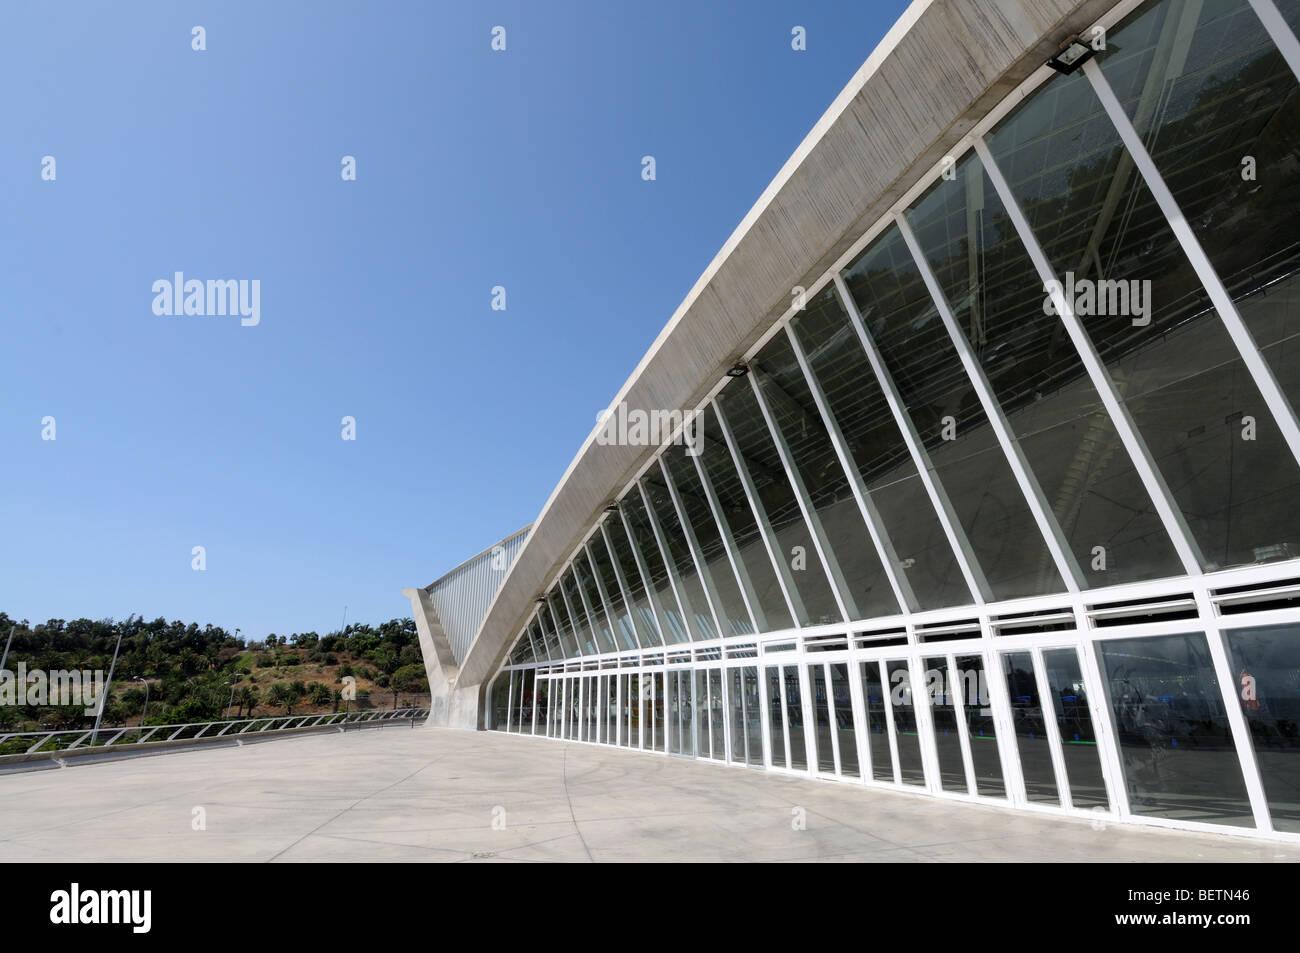 Modern Architecture Spain modern architecture in santa cruz de tenerife, canary islands